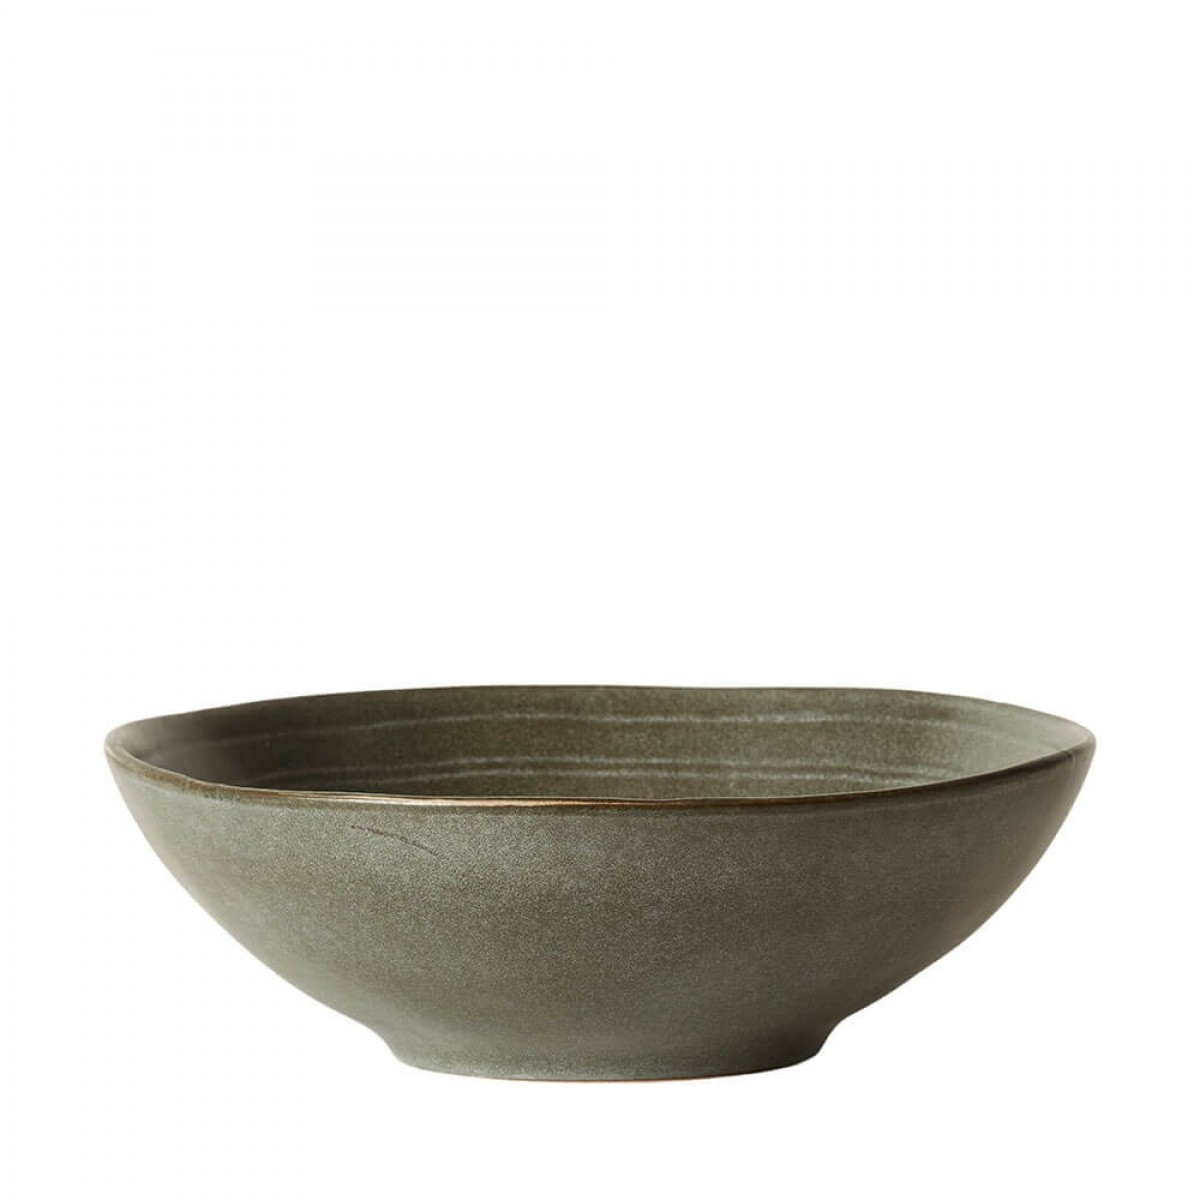 DACORE Skål stentøj 24x7 cm grå